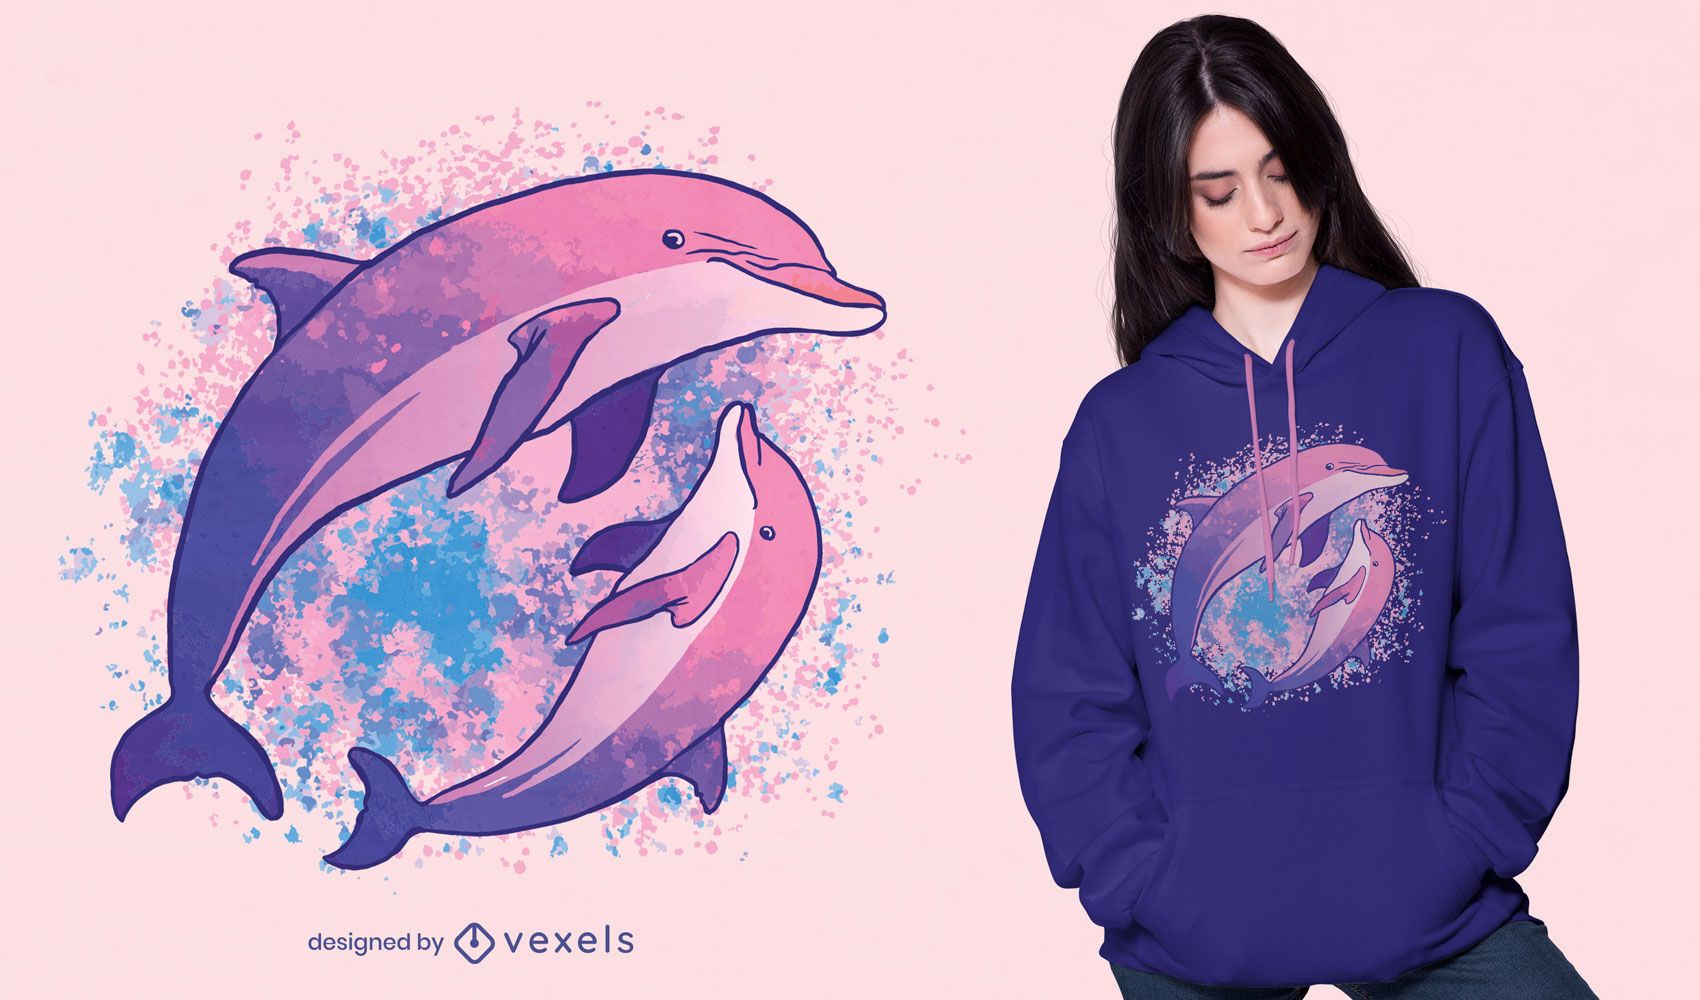 Dise?o de camiseta de composici?n de acuarela de delfines.